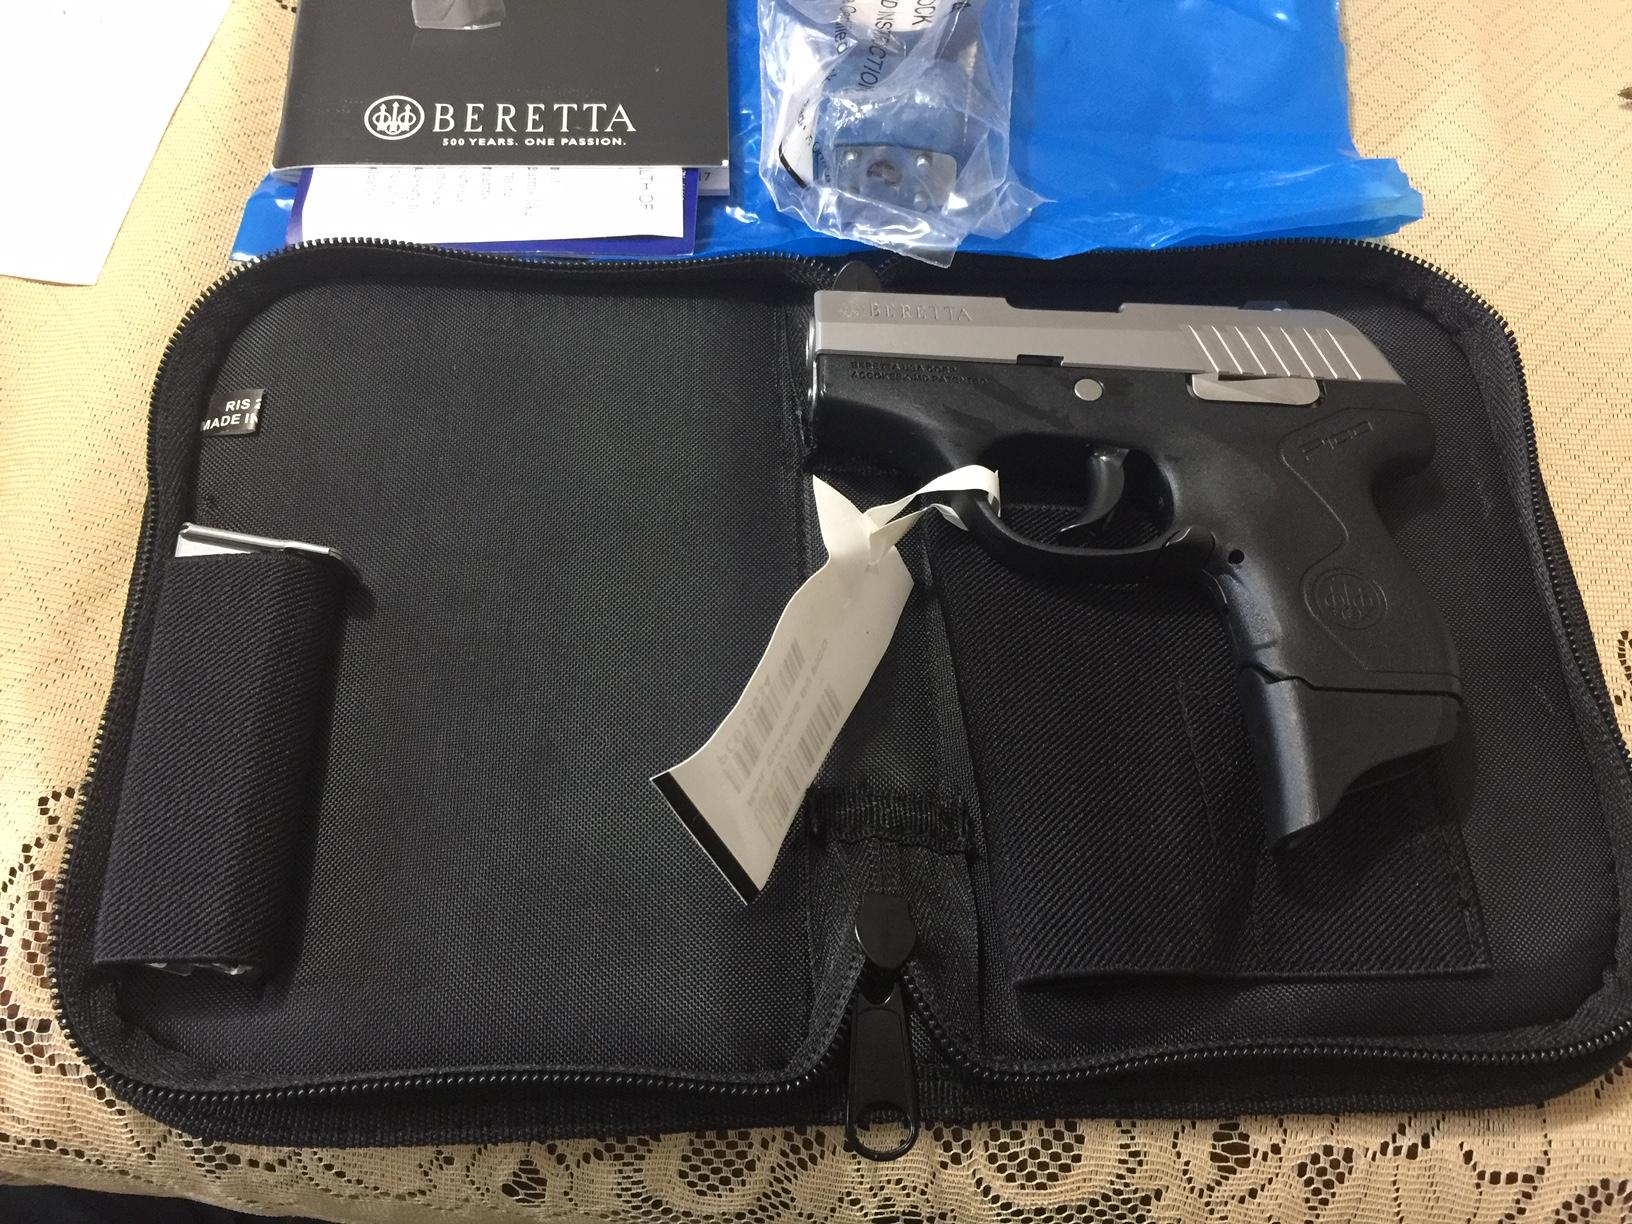 For Sale in KENTUCKY - Beretta PICO INOX-img_2069.jpg